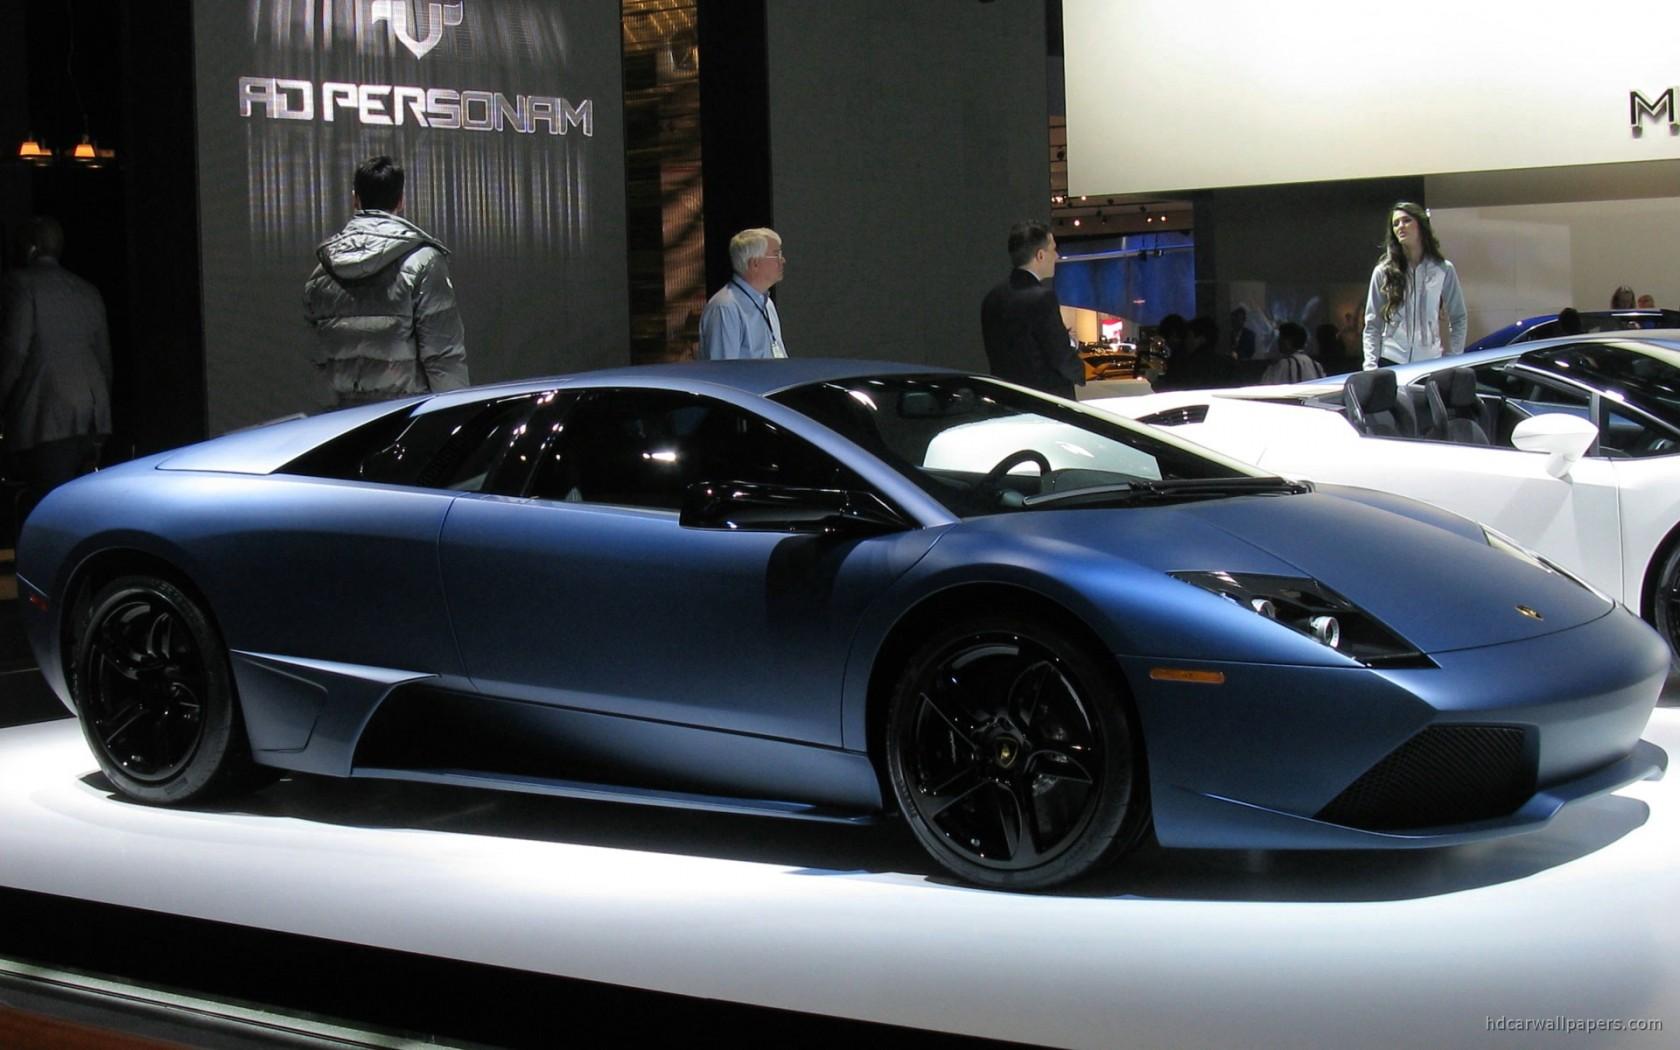 Cars Wallpapers: Lamborghini Ad Personam Cars Wallpaper